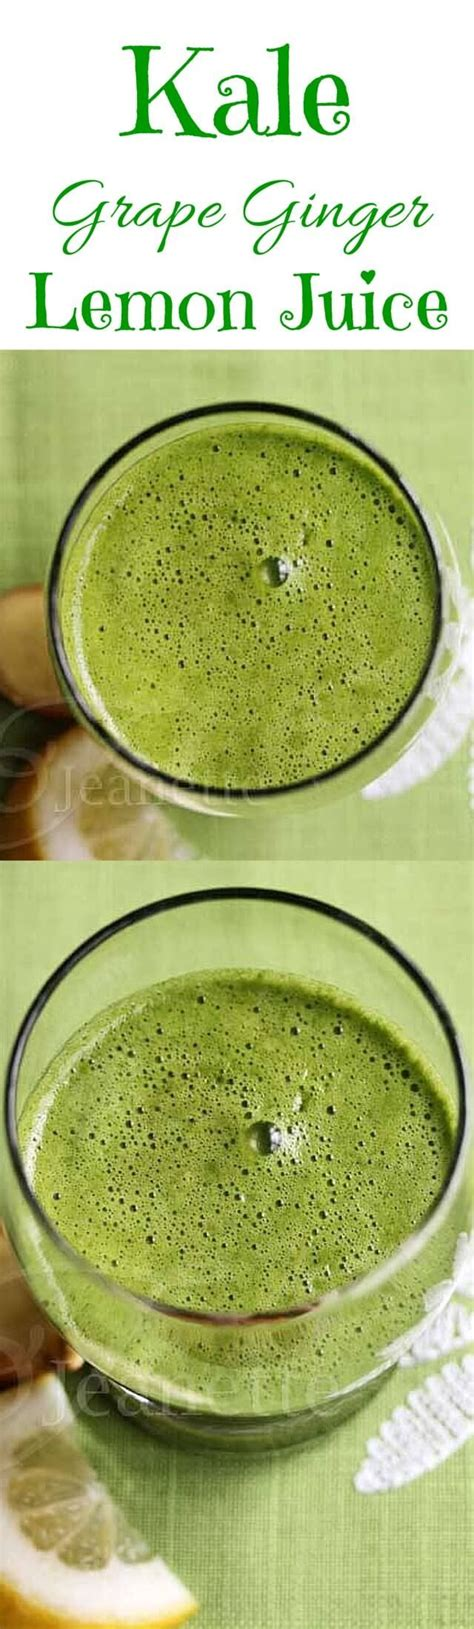 Kale Juice Detox Diet by 100 Kale Juice Recipes On Green Juice Cleanse